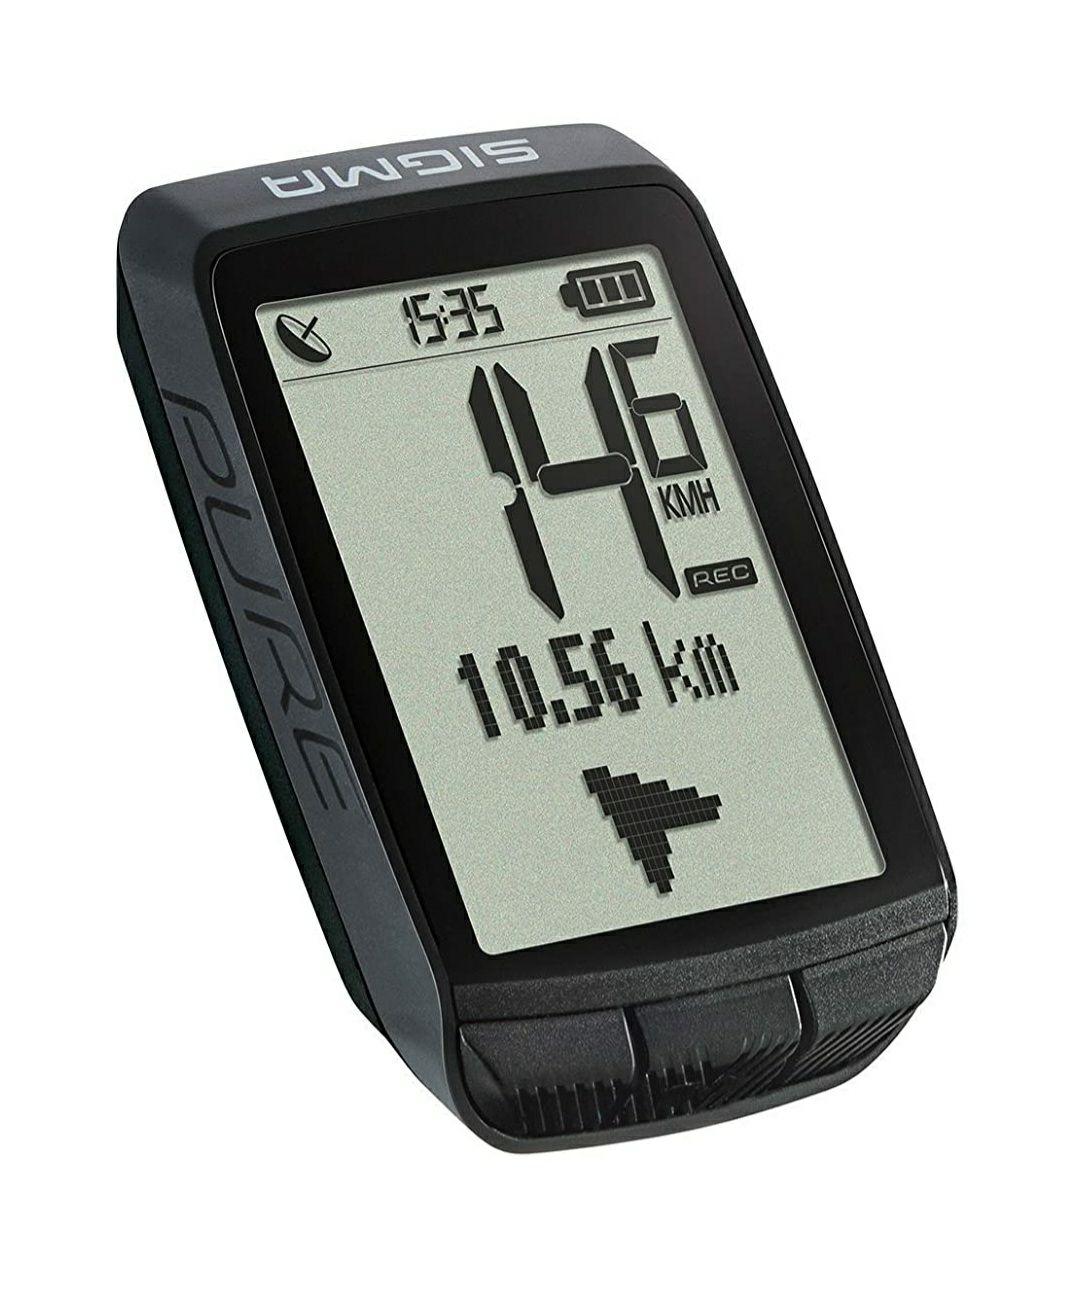 Sigma Sport PURE GPS Cyclo Computer - £26.95 @ Amazon